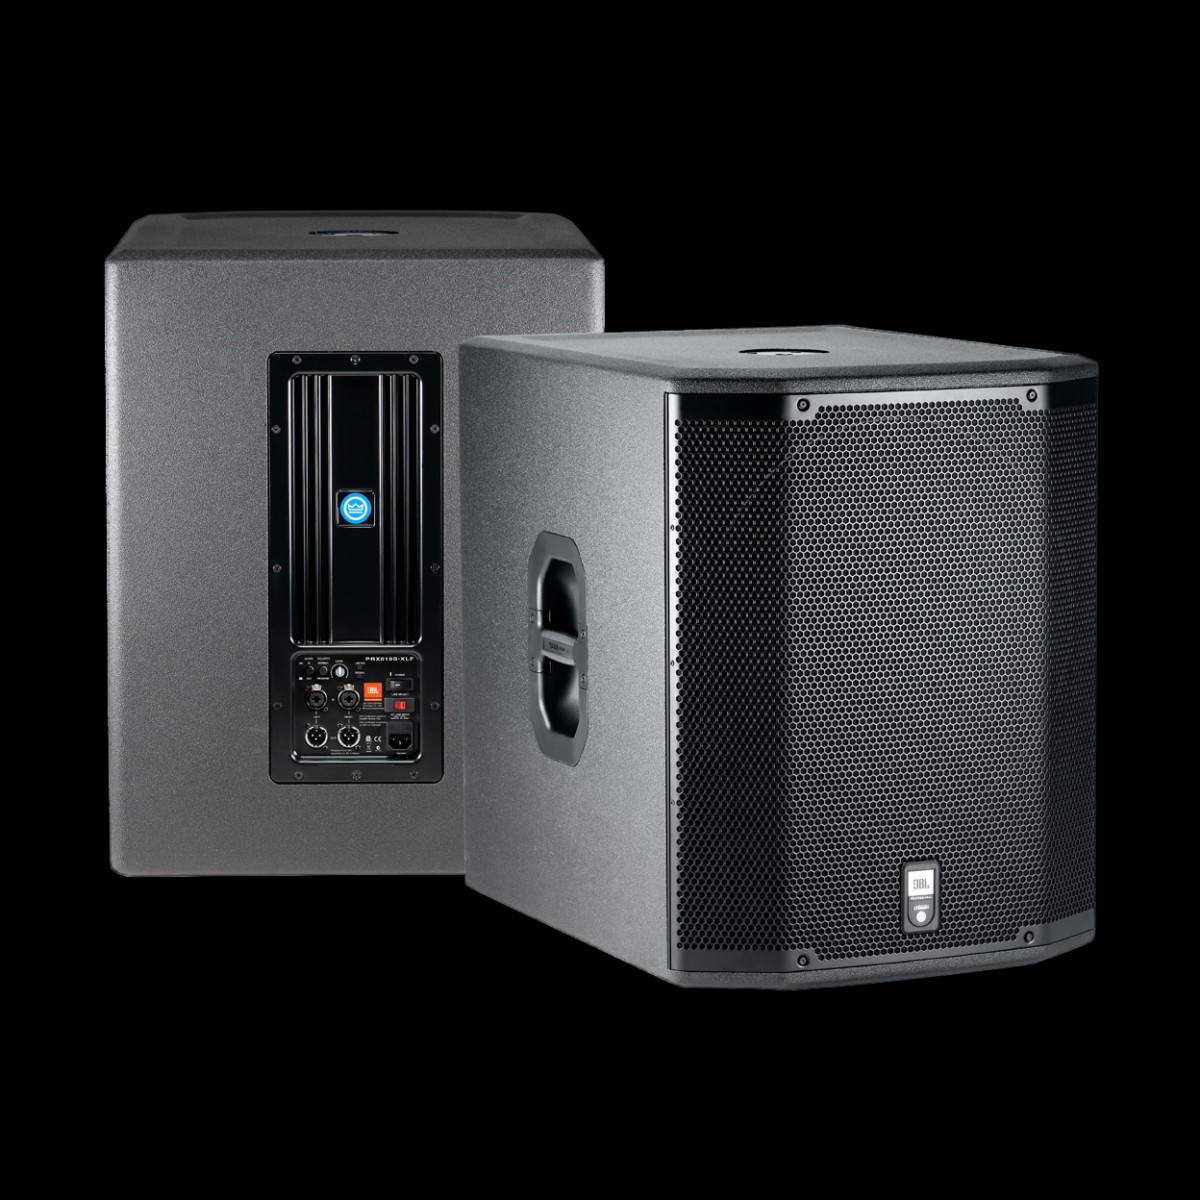 jbl prx 600 prx618 s xlf grille voor luidsprekerhoes baseline